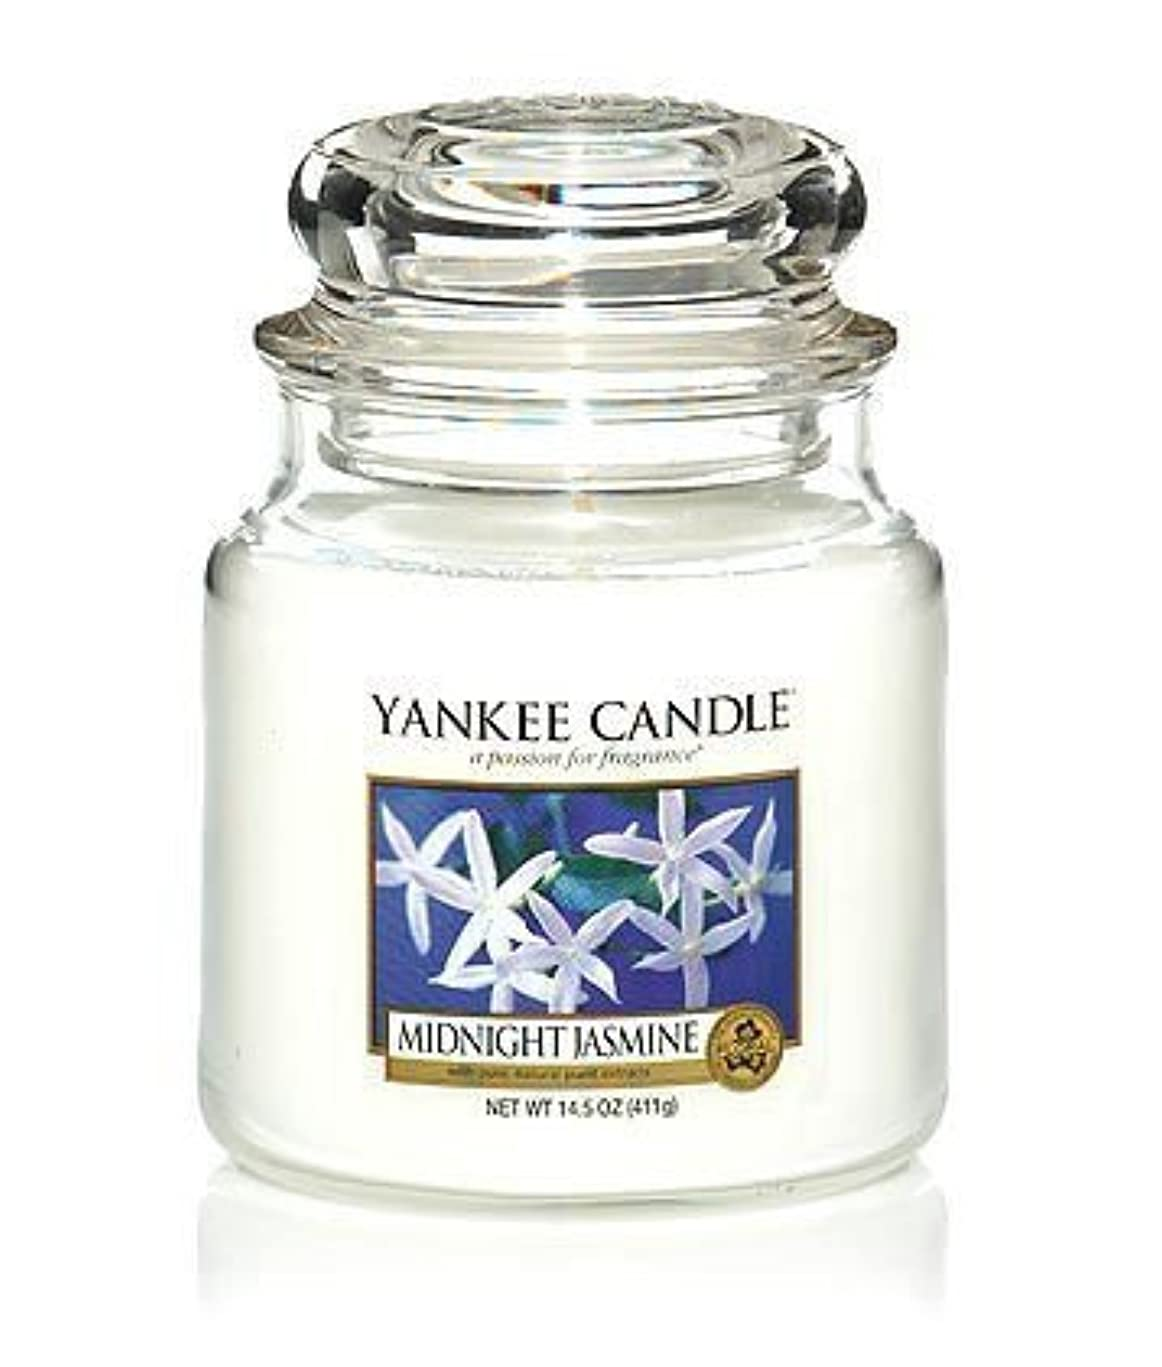 国九共産主義者Yankee Candle Midnight Jasmine Medium Jar Candle, Floral Scent by Yankee Candle [並行輸入品]